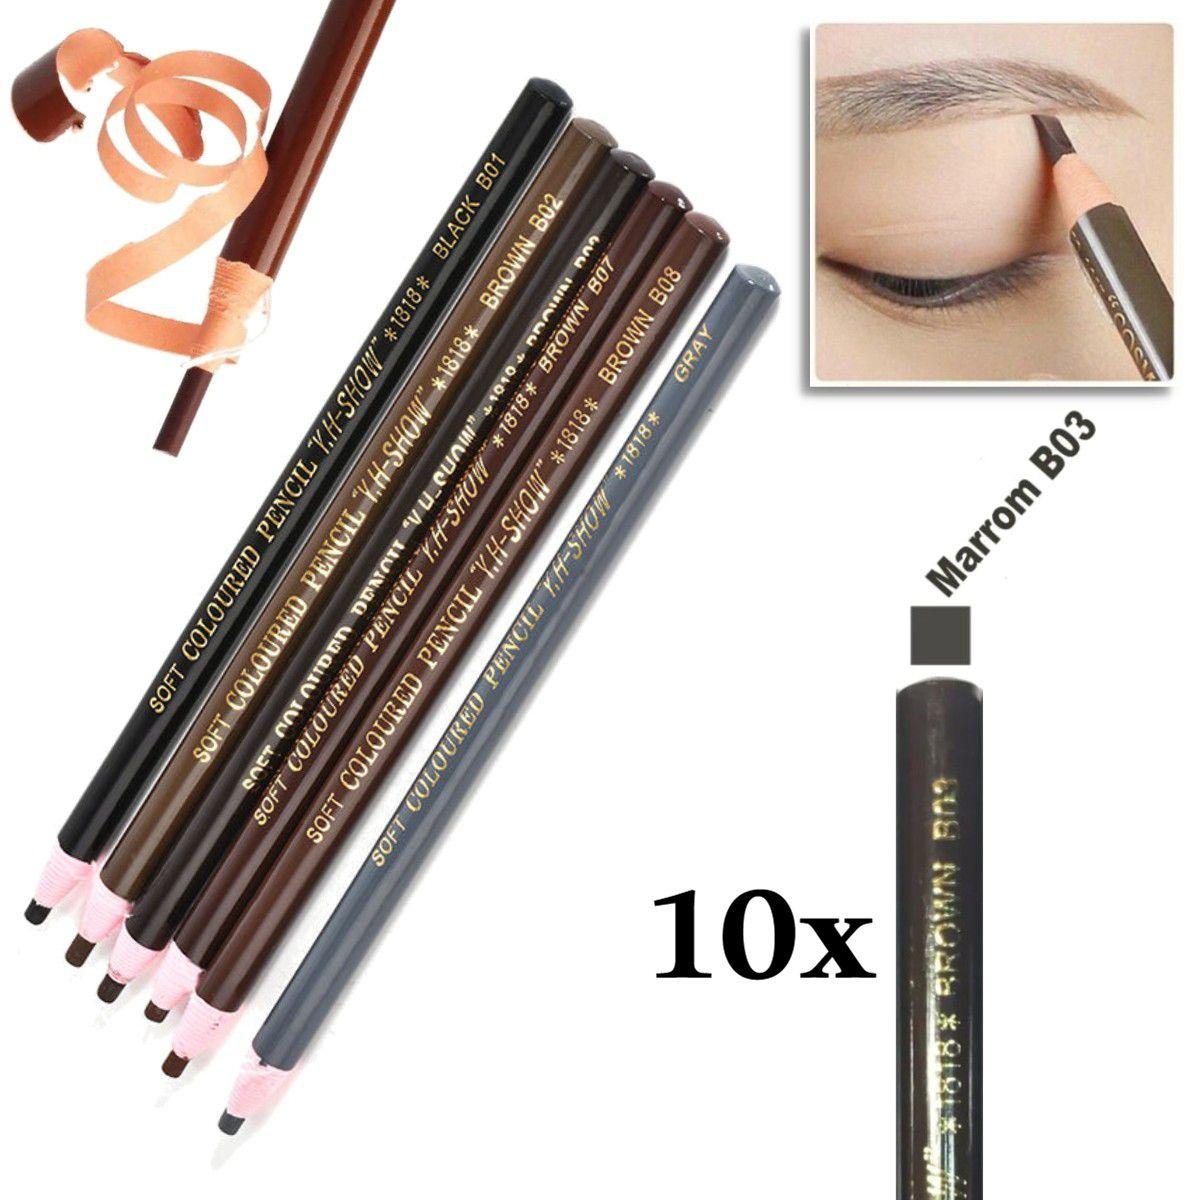 Kit 10 Lapis Dermografico Dermatografico Sobrancelhas Micropigmentação - Marrom Escuro B03